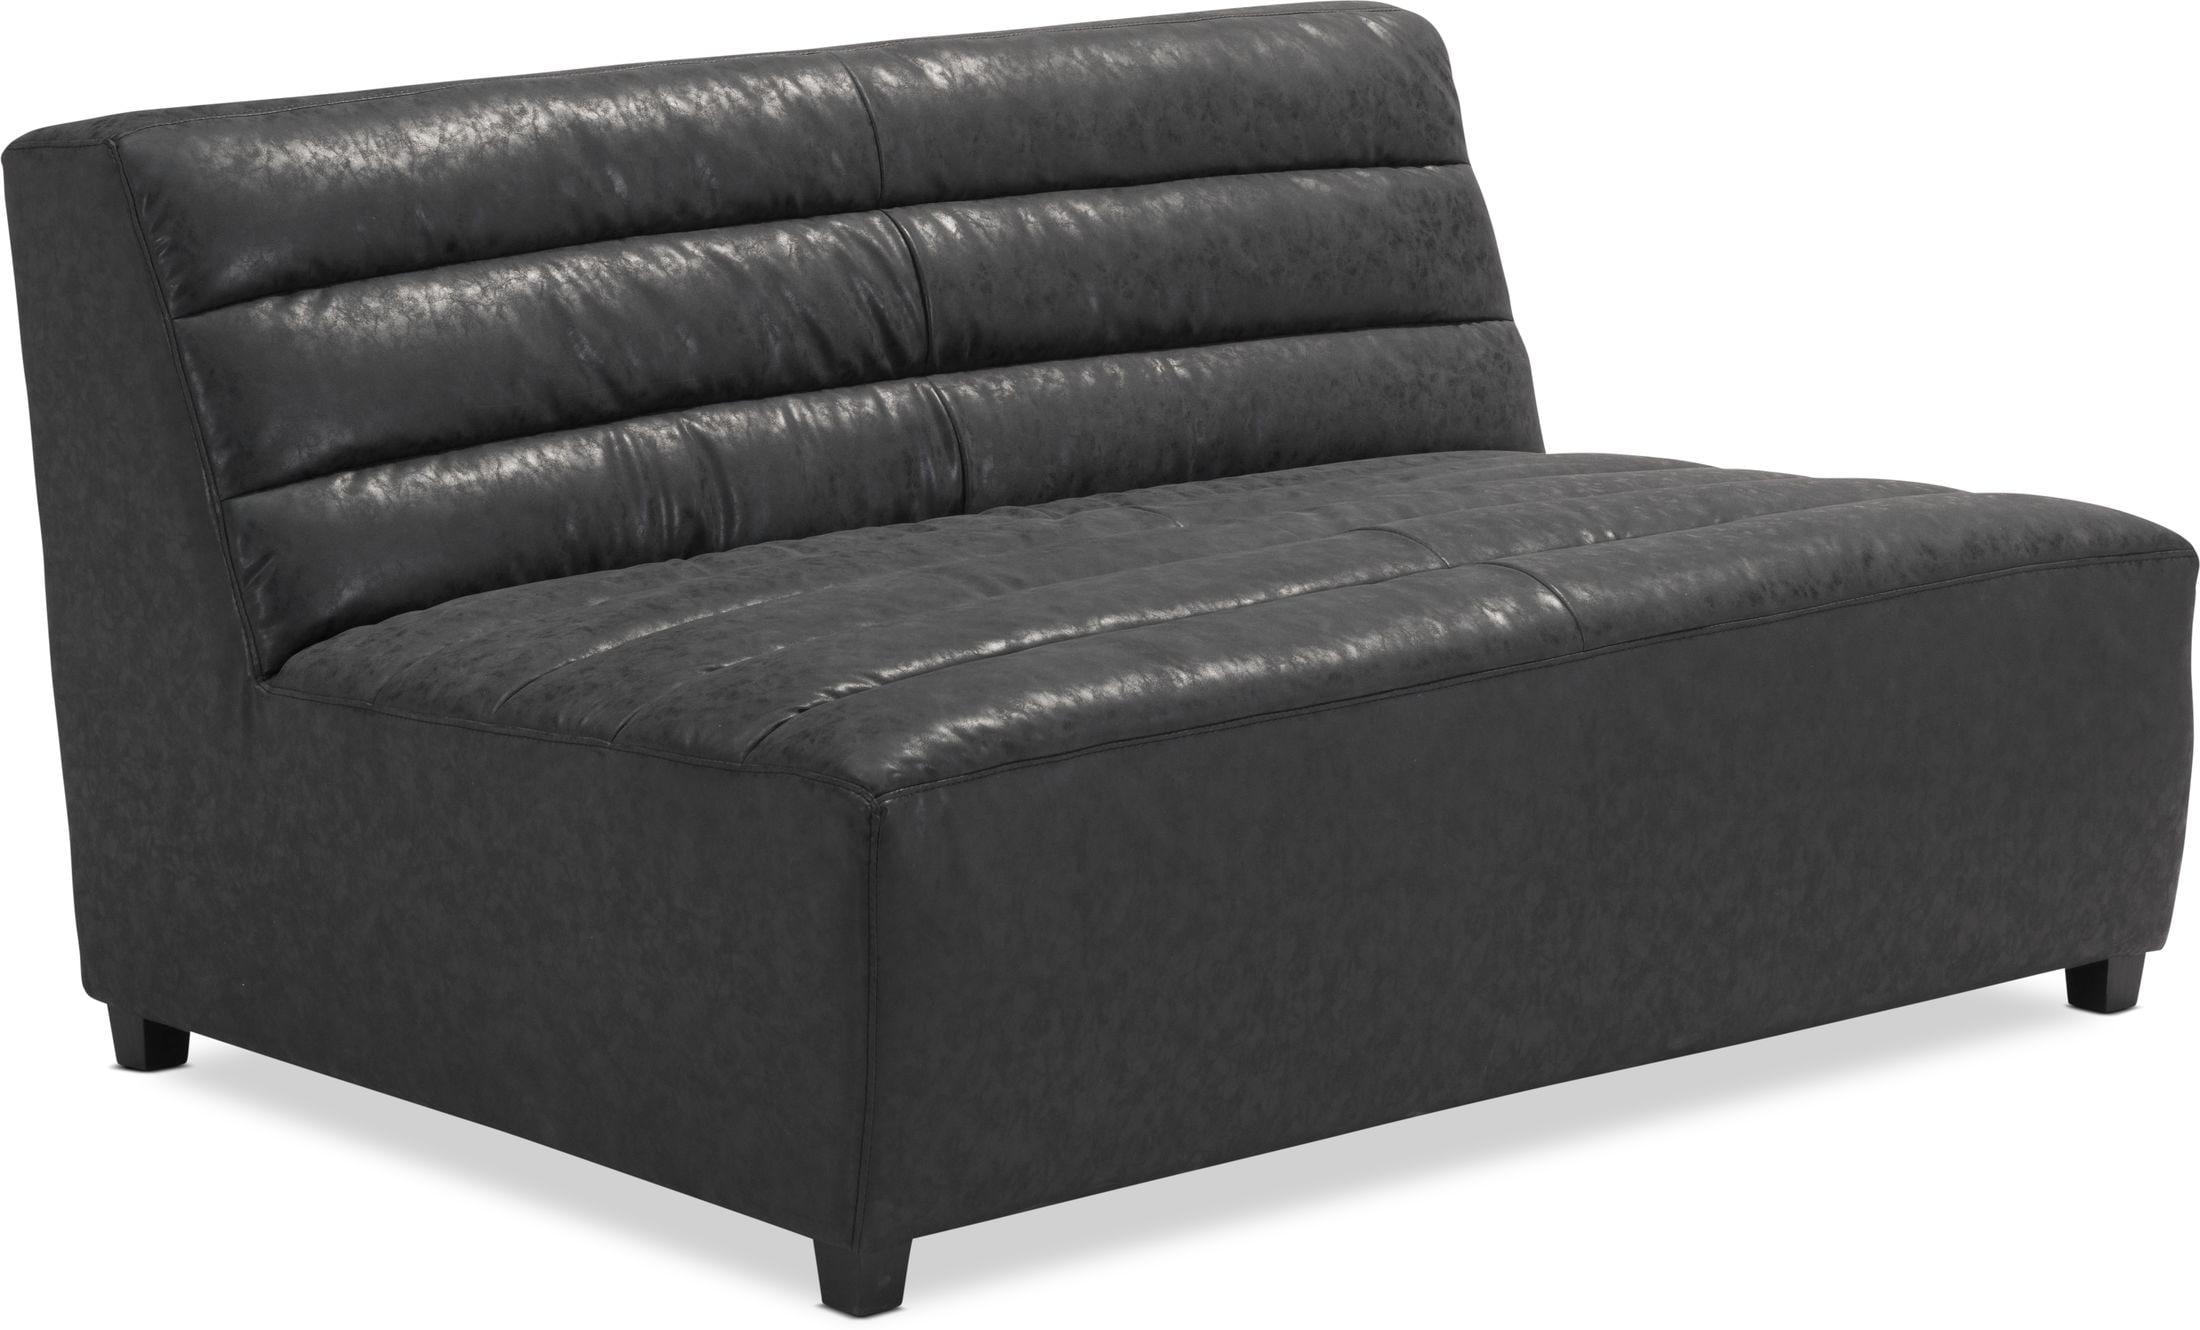 Living Room Furniture - Phoenix Loveseat